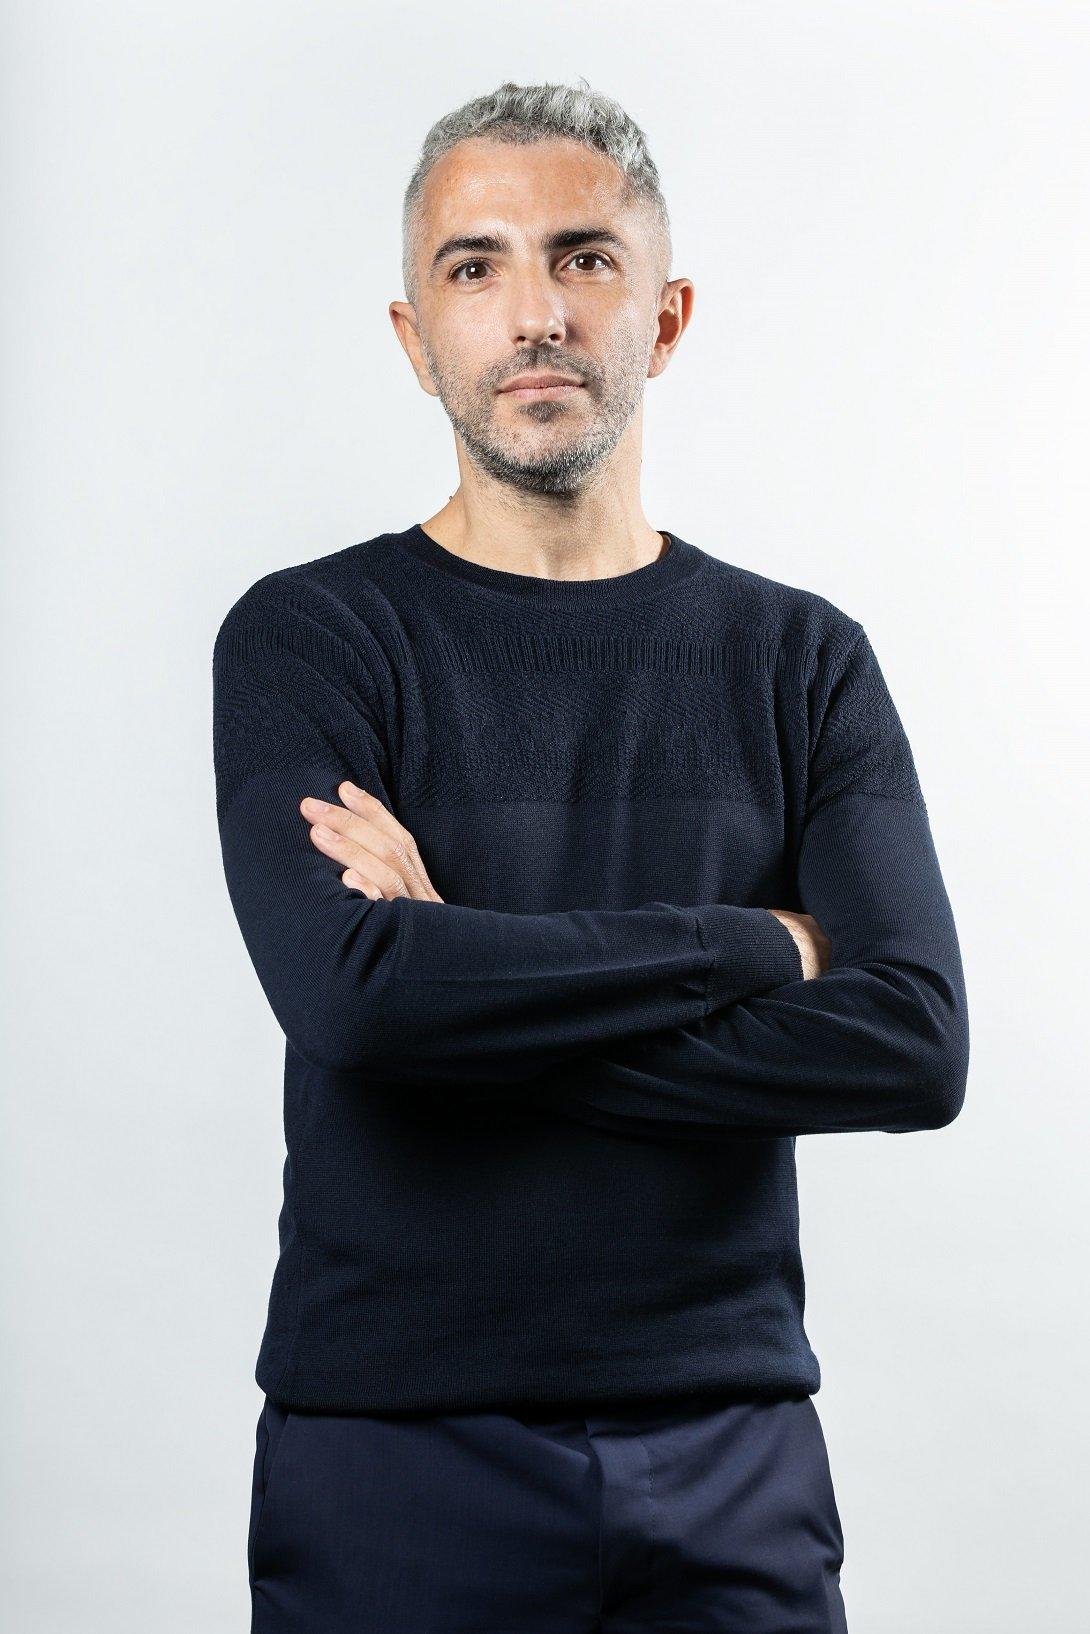 Damiano Gulli Foto Gianlica Di Ioia